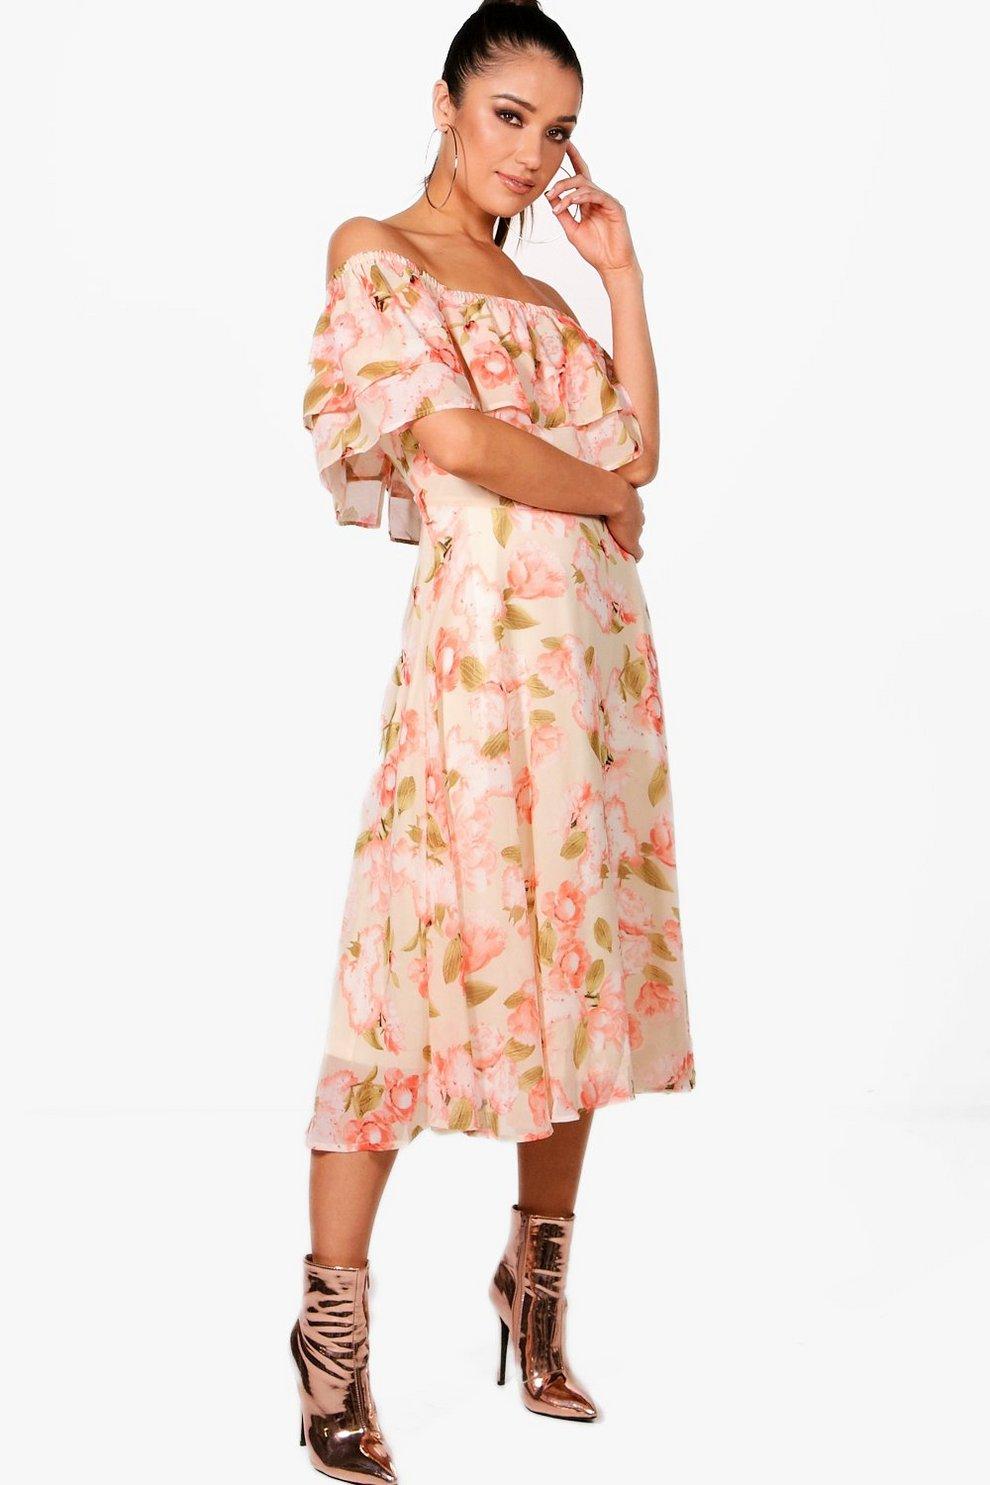 51a30ed4cf034 Chiffon Floral Midi Skater Dress | Boohoo